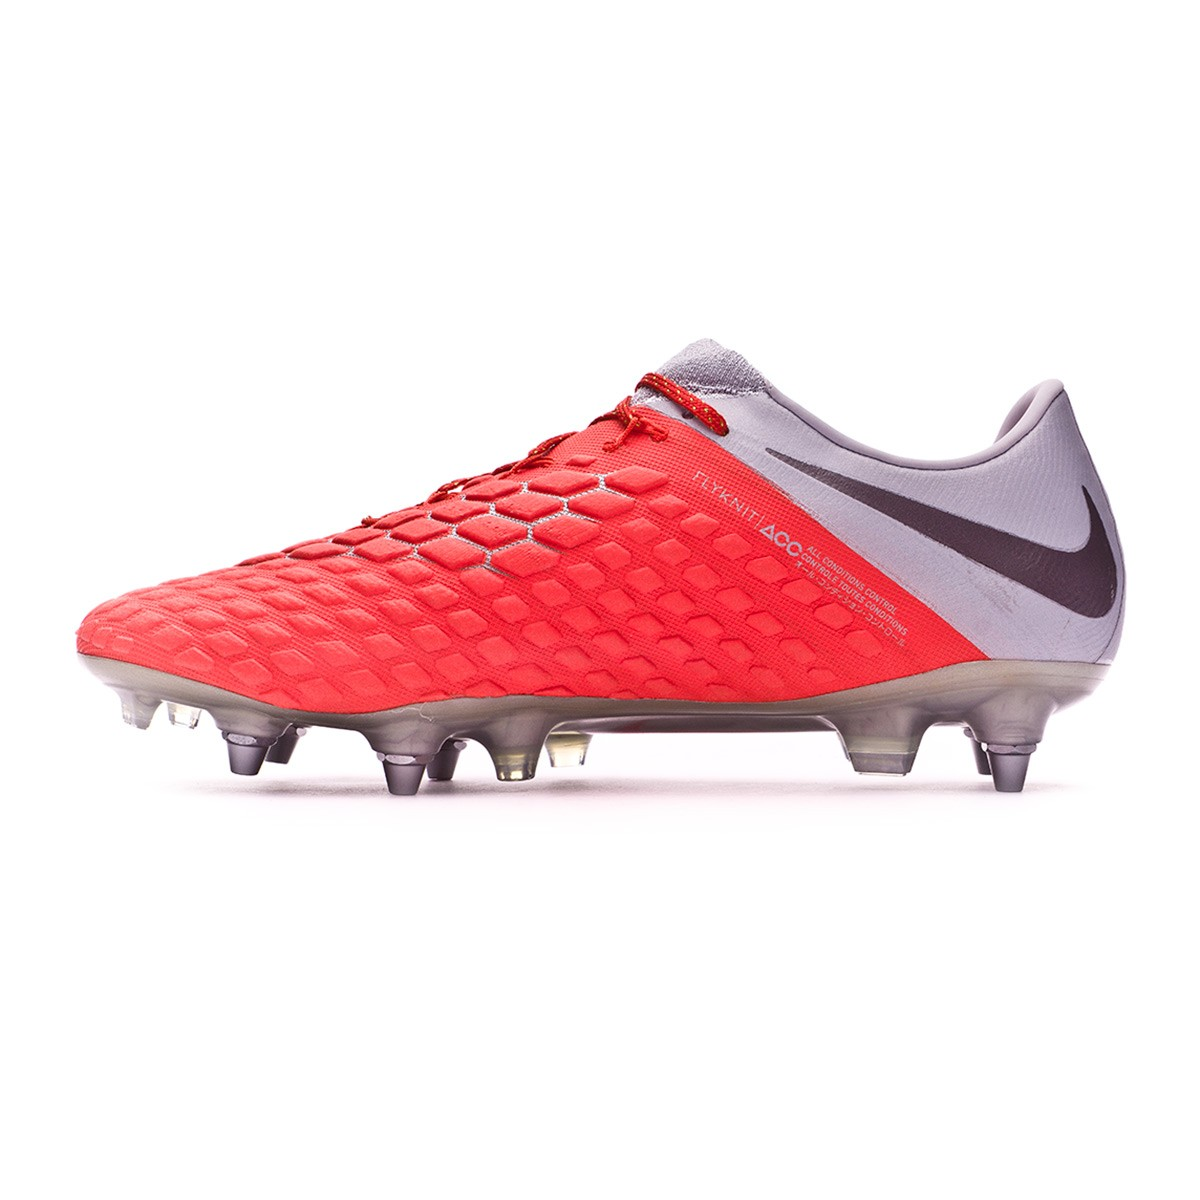 outlet store 071c3 5f203 Football Boots Nike Hypervenom Phantom III Elite Anti-Clog SG-Pro Light  crimson-Metallic dark grey-Wolf grey - Football store Fútbol Emotion